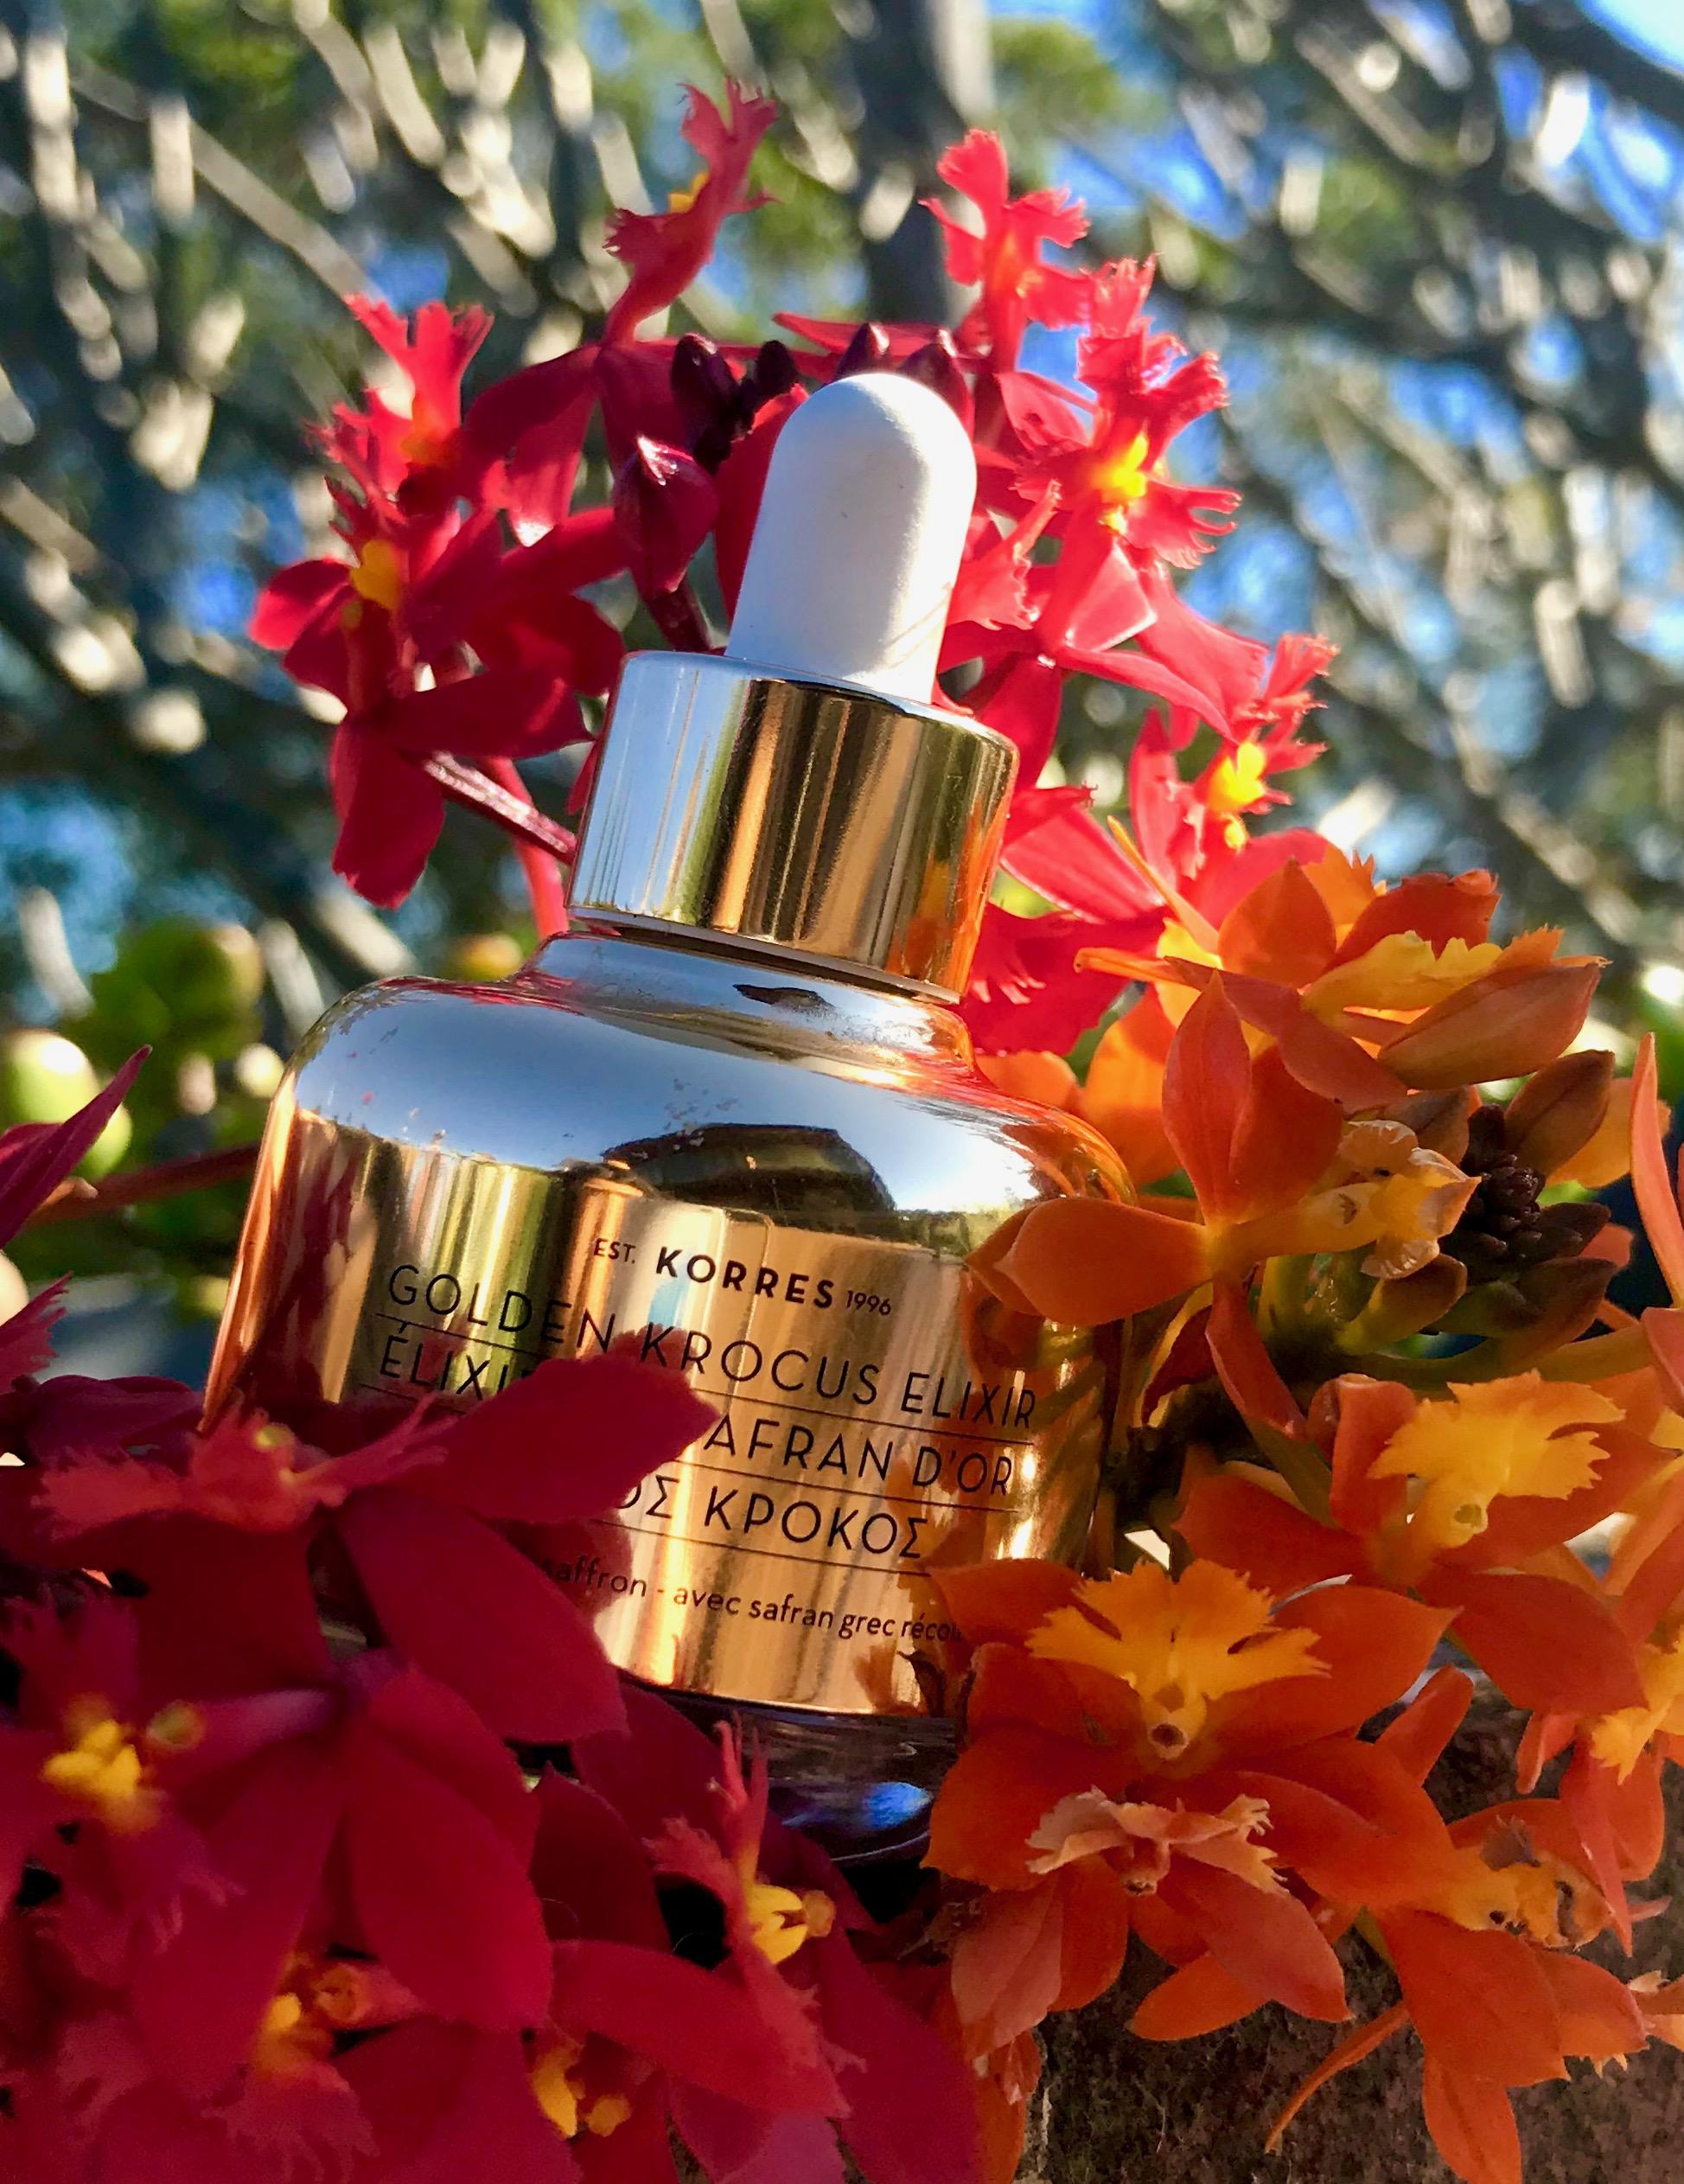 Kim K Pham Product Review Korres Golden Krocus Ageless Elixr Serum